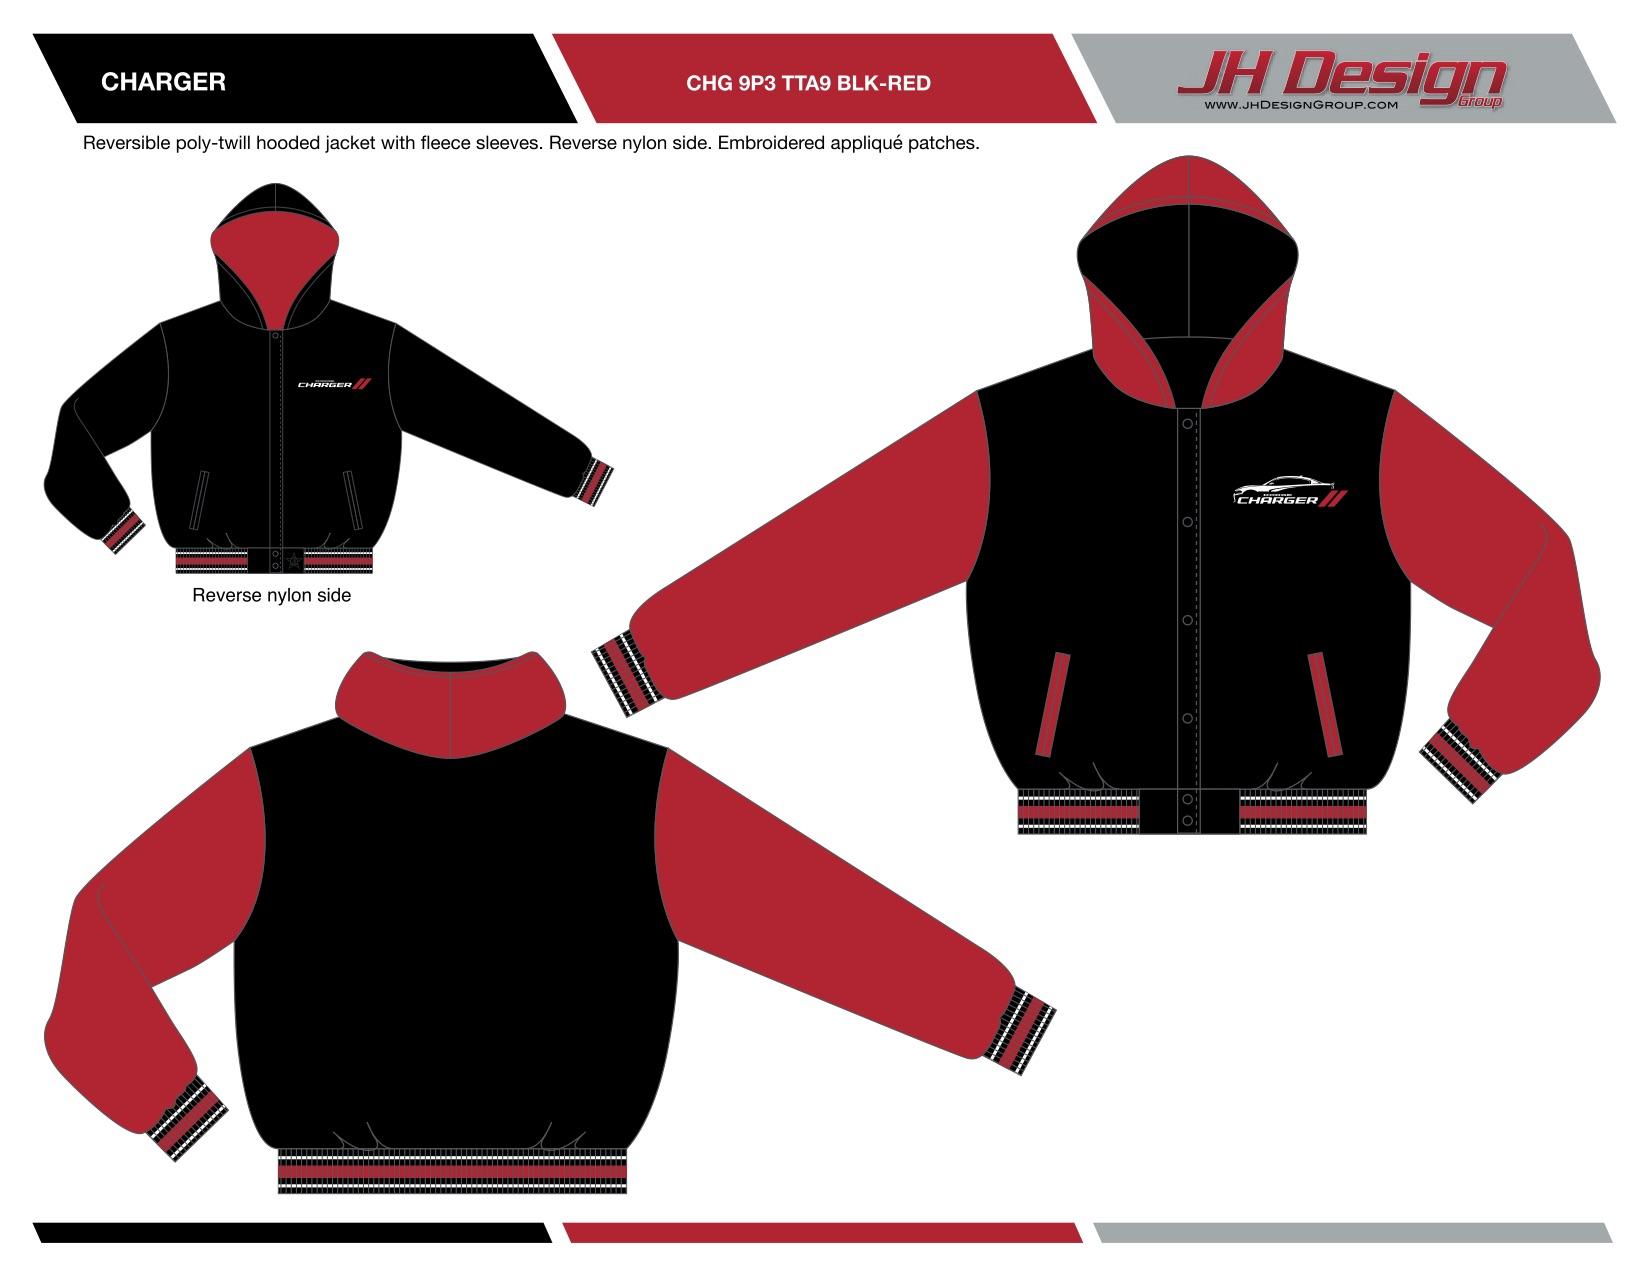 CHG 9P3 TTA9 BLK-RED